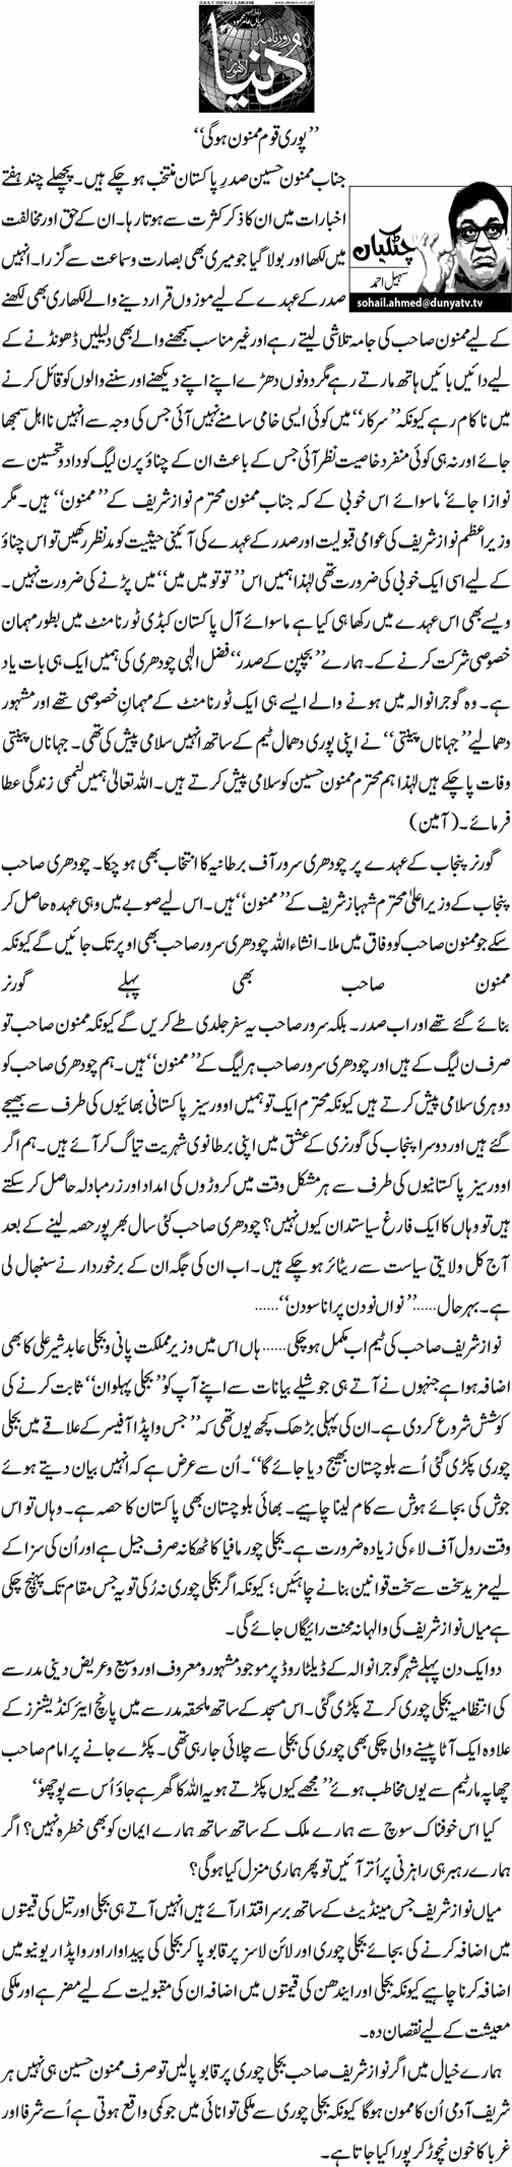 """Poori Qaum Mamnoon Ho Gi"" - Sohail Ahmed"